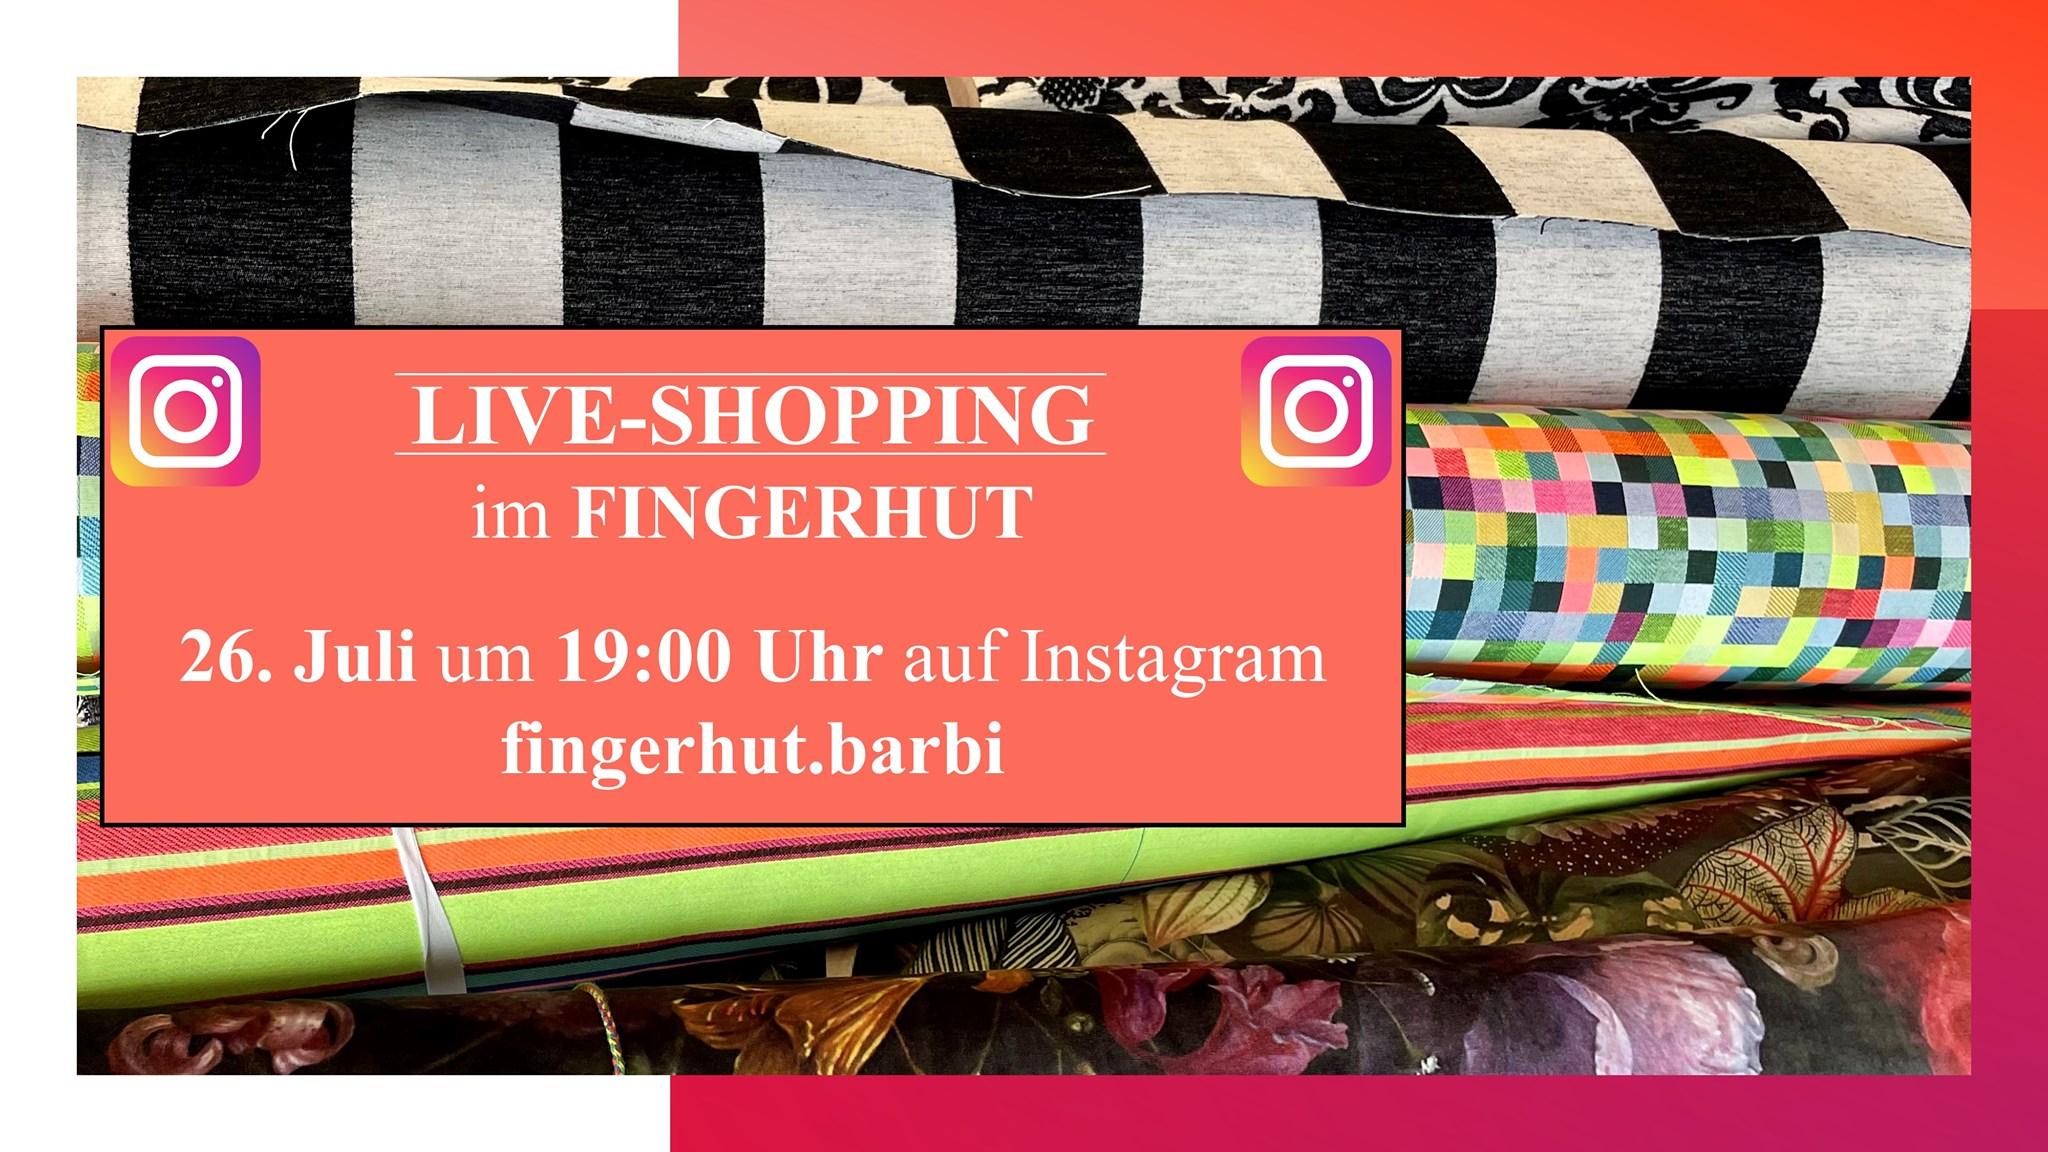 Instagram Live-Shopping im Fingerhut Juli 2021